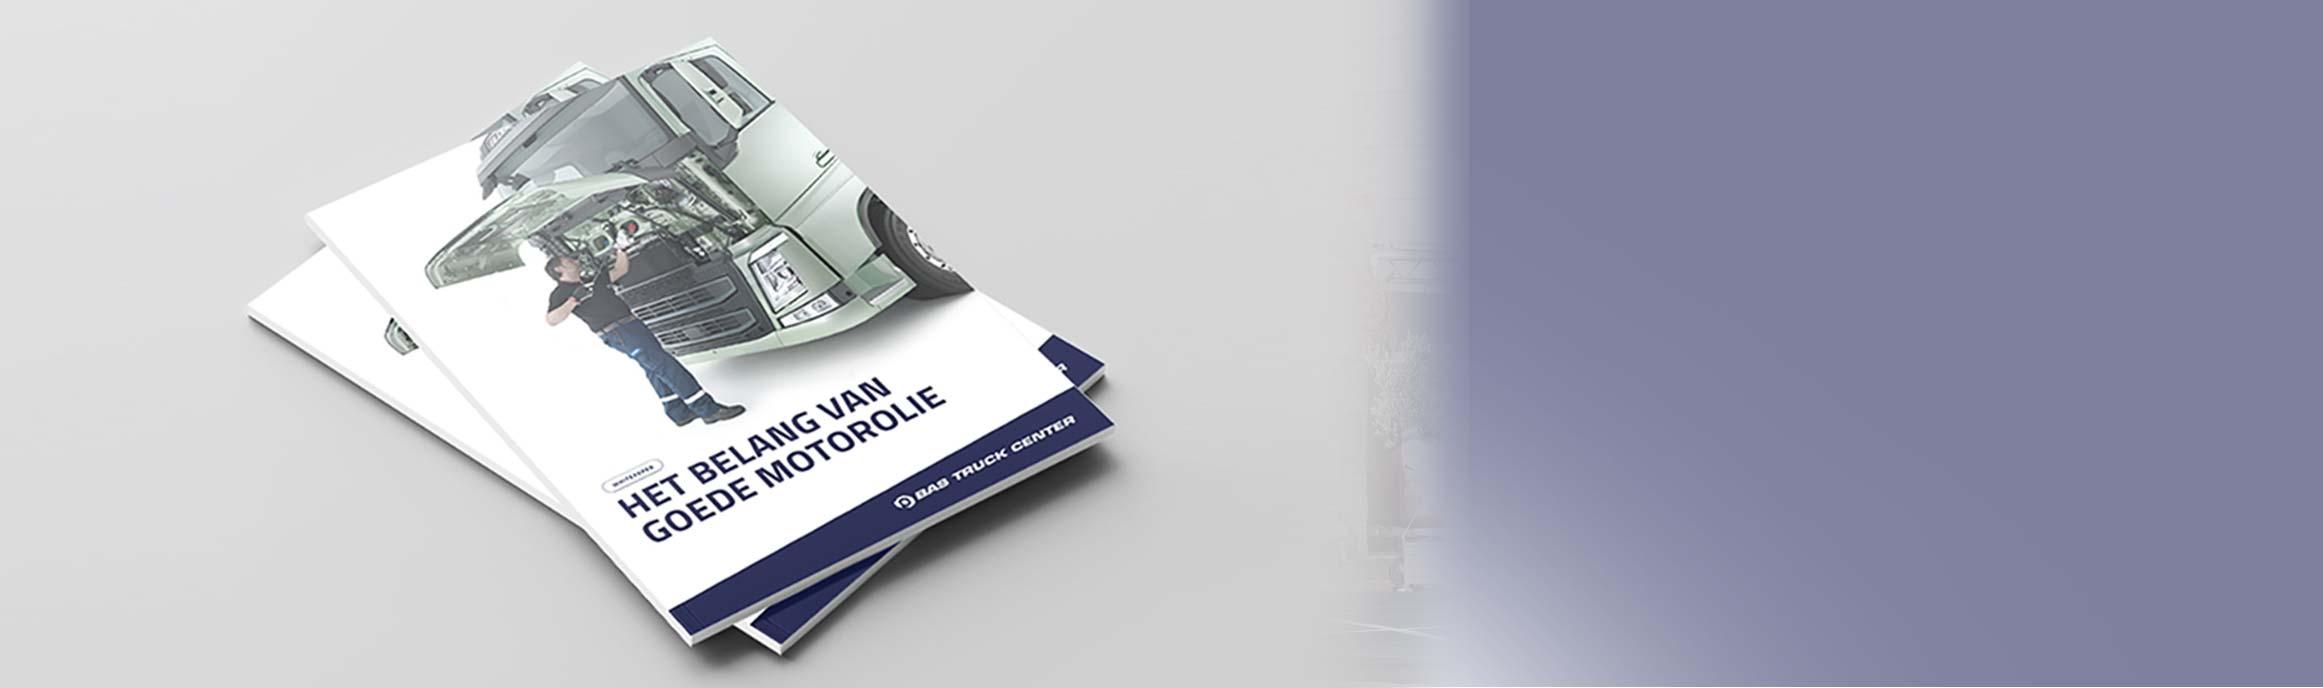 Whitepaper | Het belang van goede motorolie